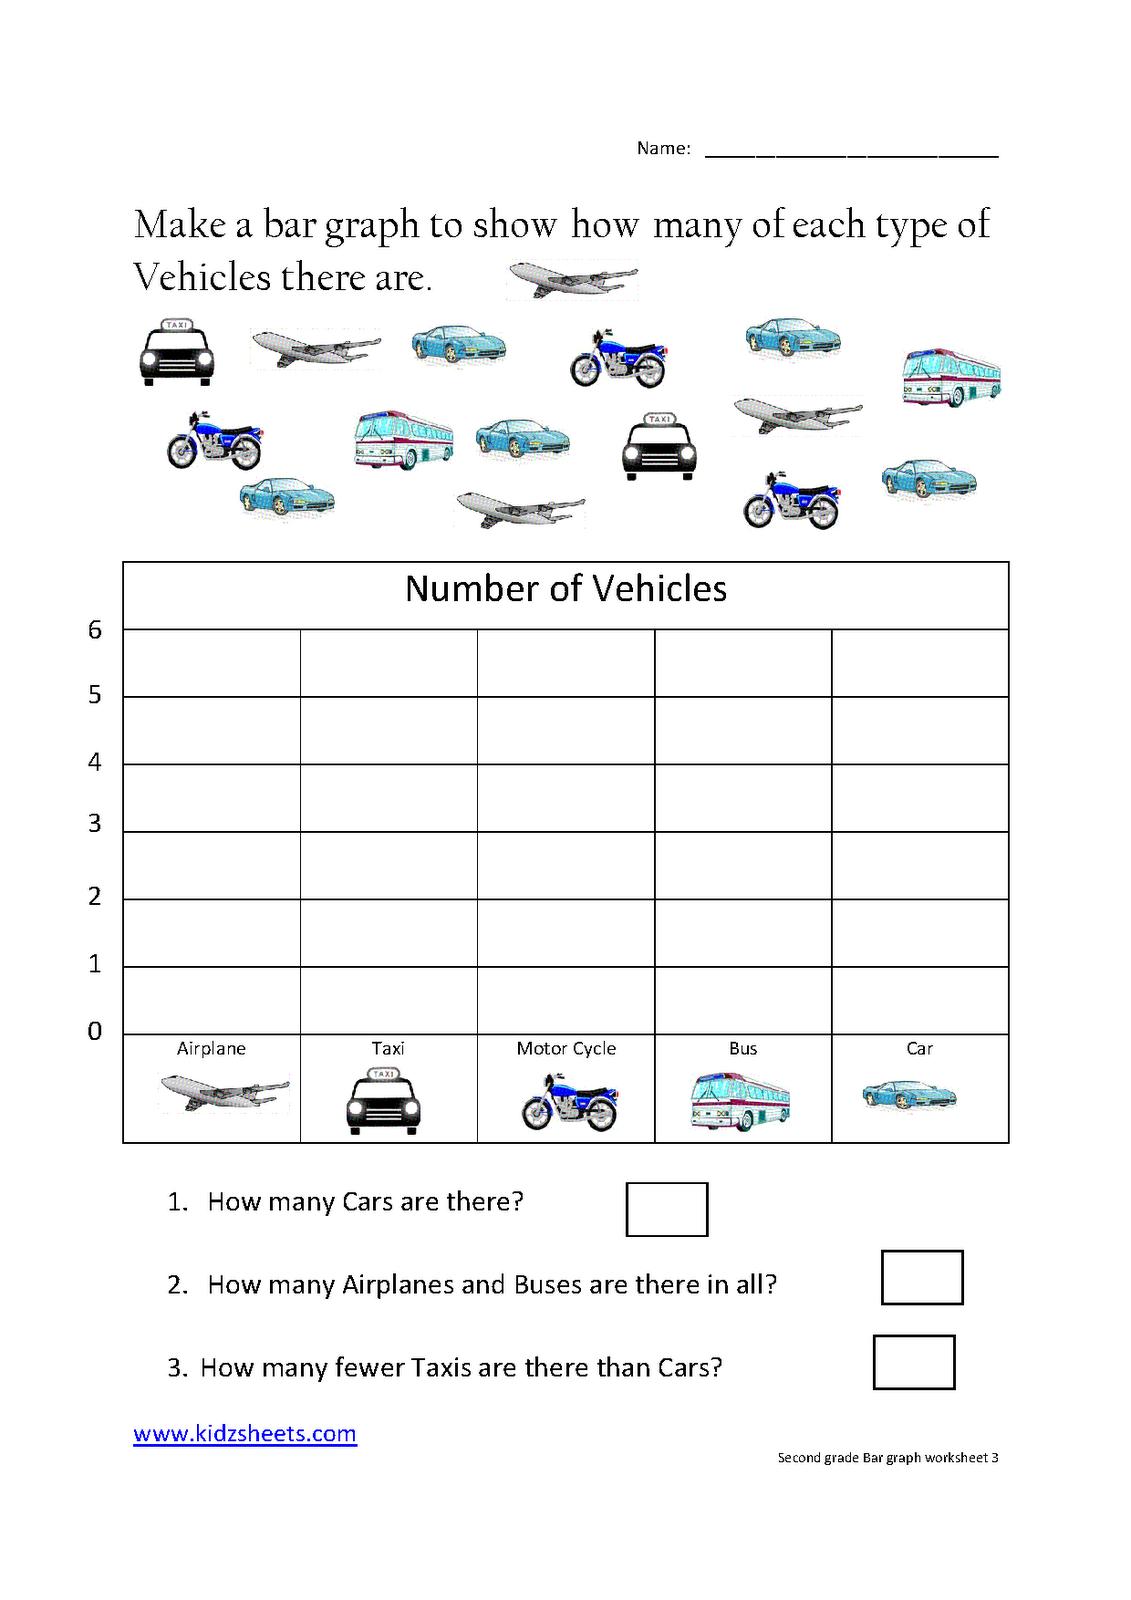 Elementary Bar Graph Worksheets The Best Worksheets Image